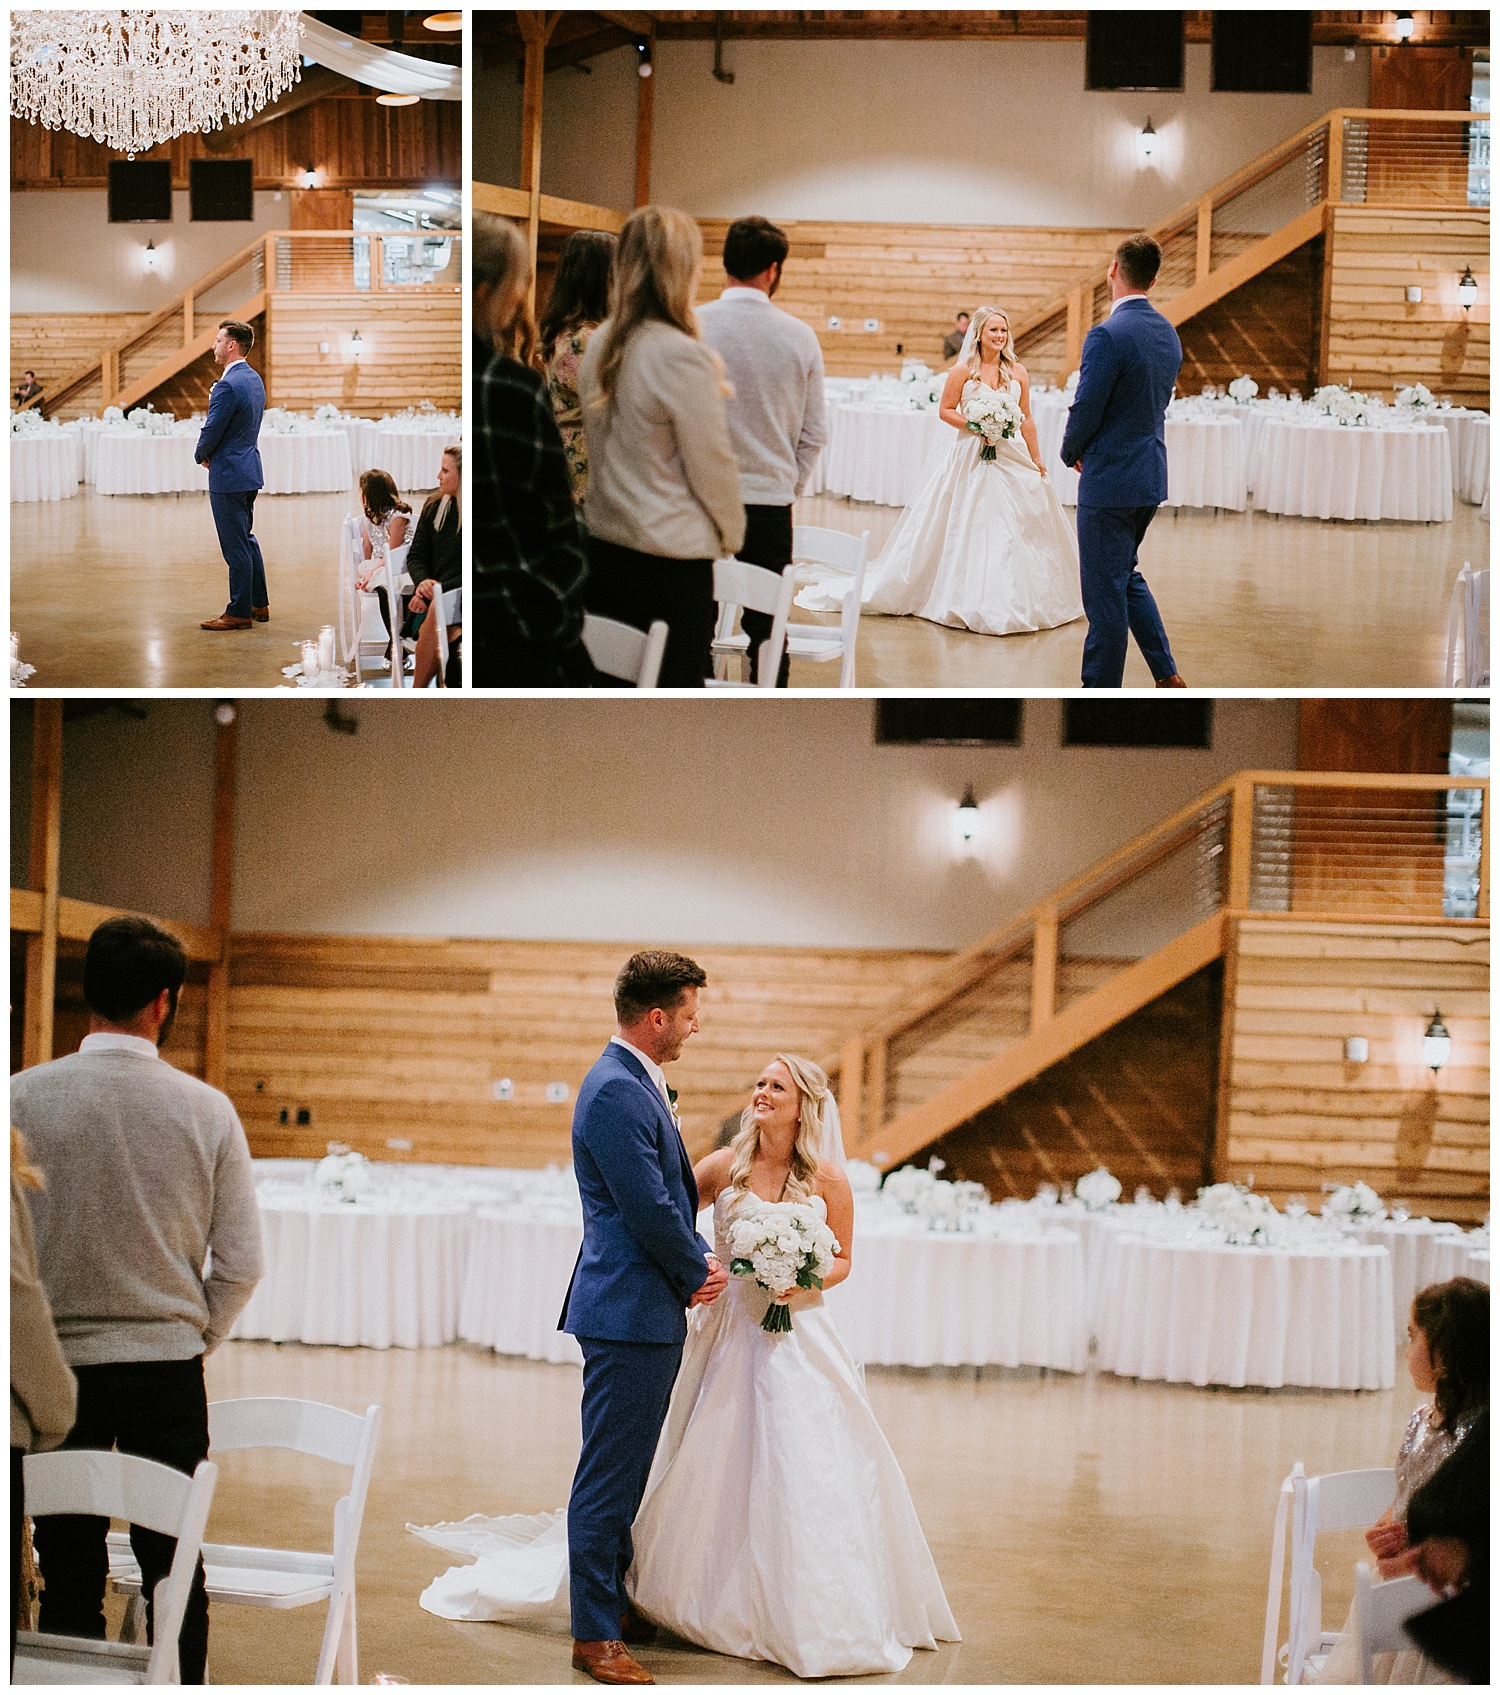 classy-wedding-sycamore_farms-nashville-tn2019-01-22_0058.jpg